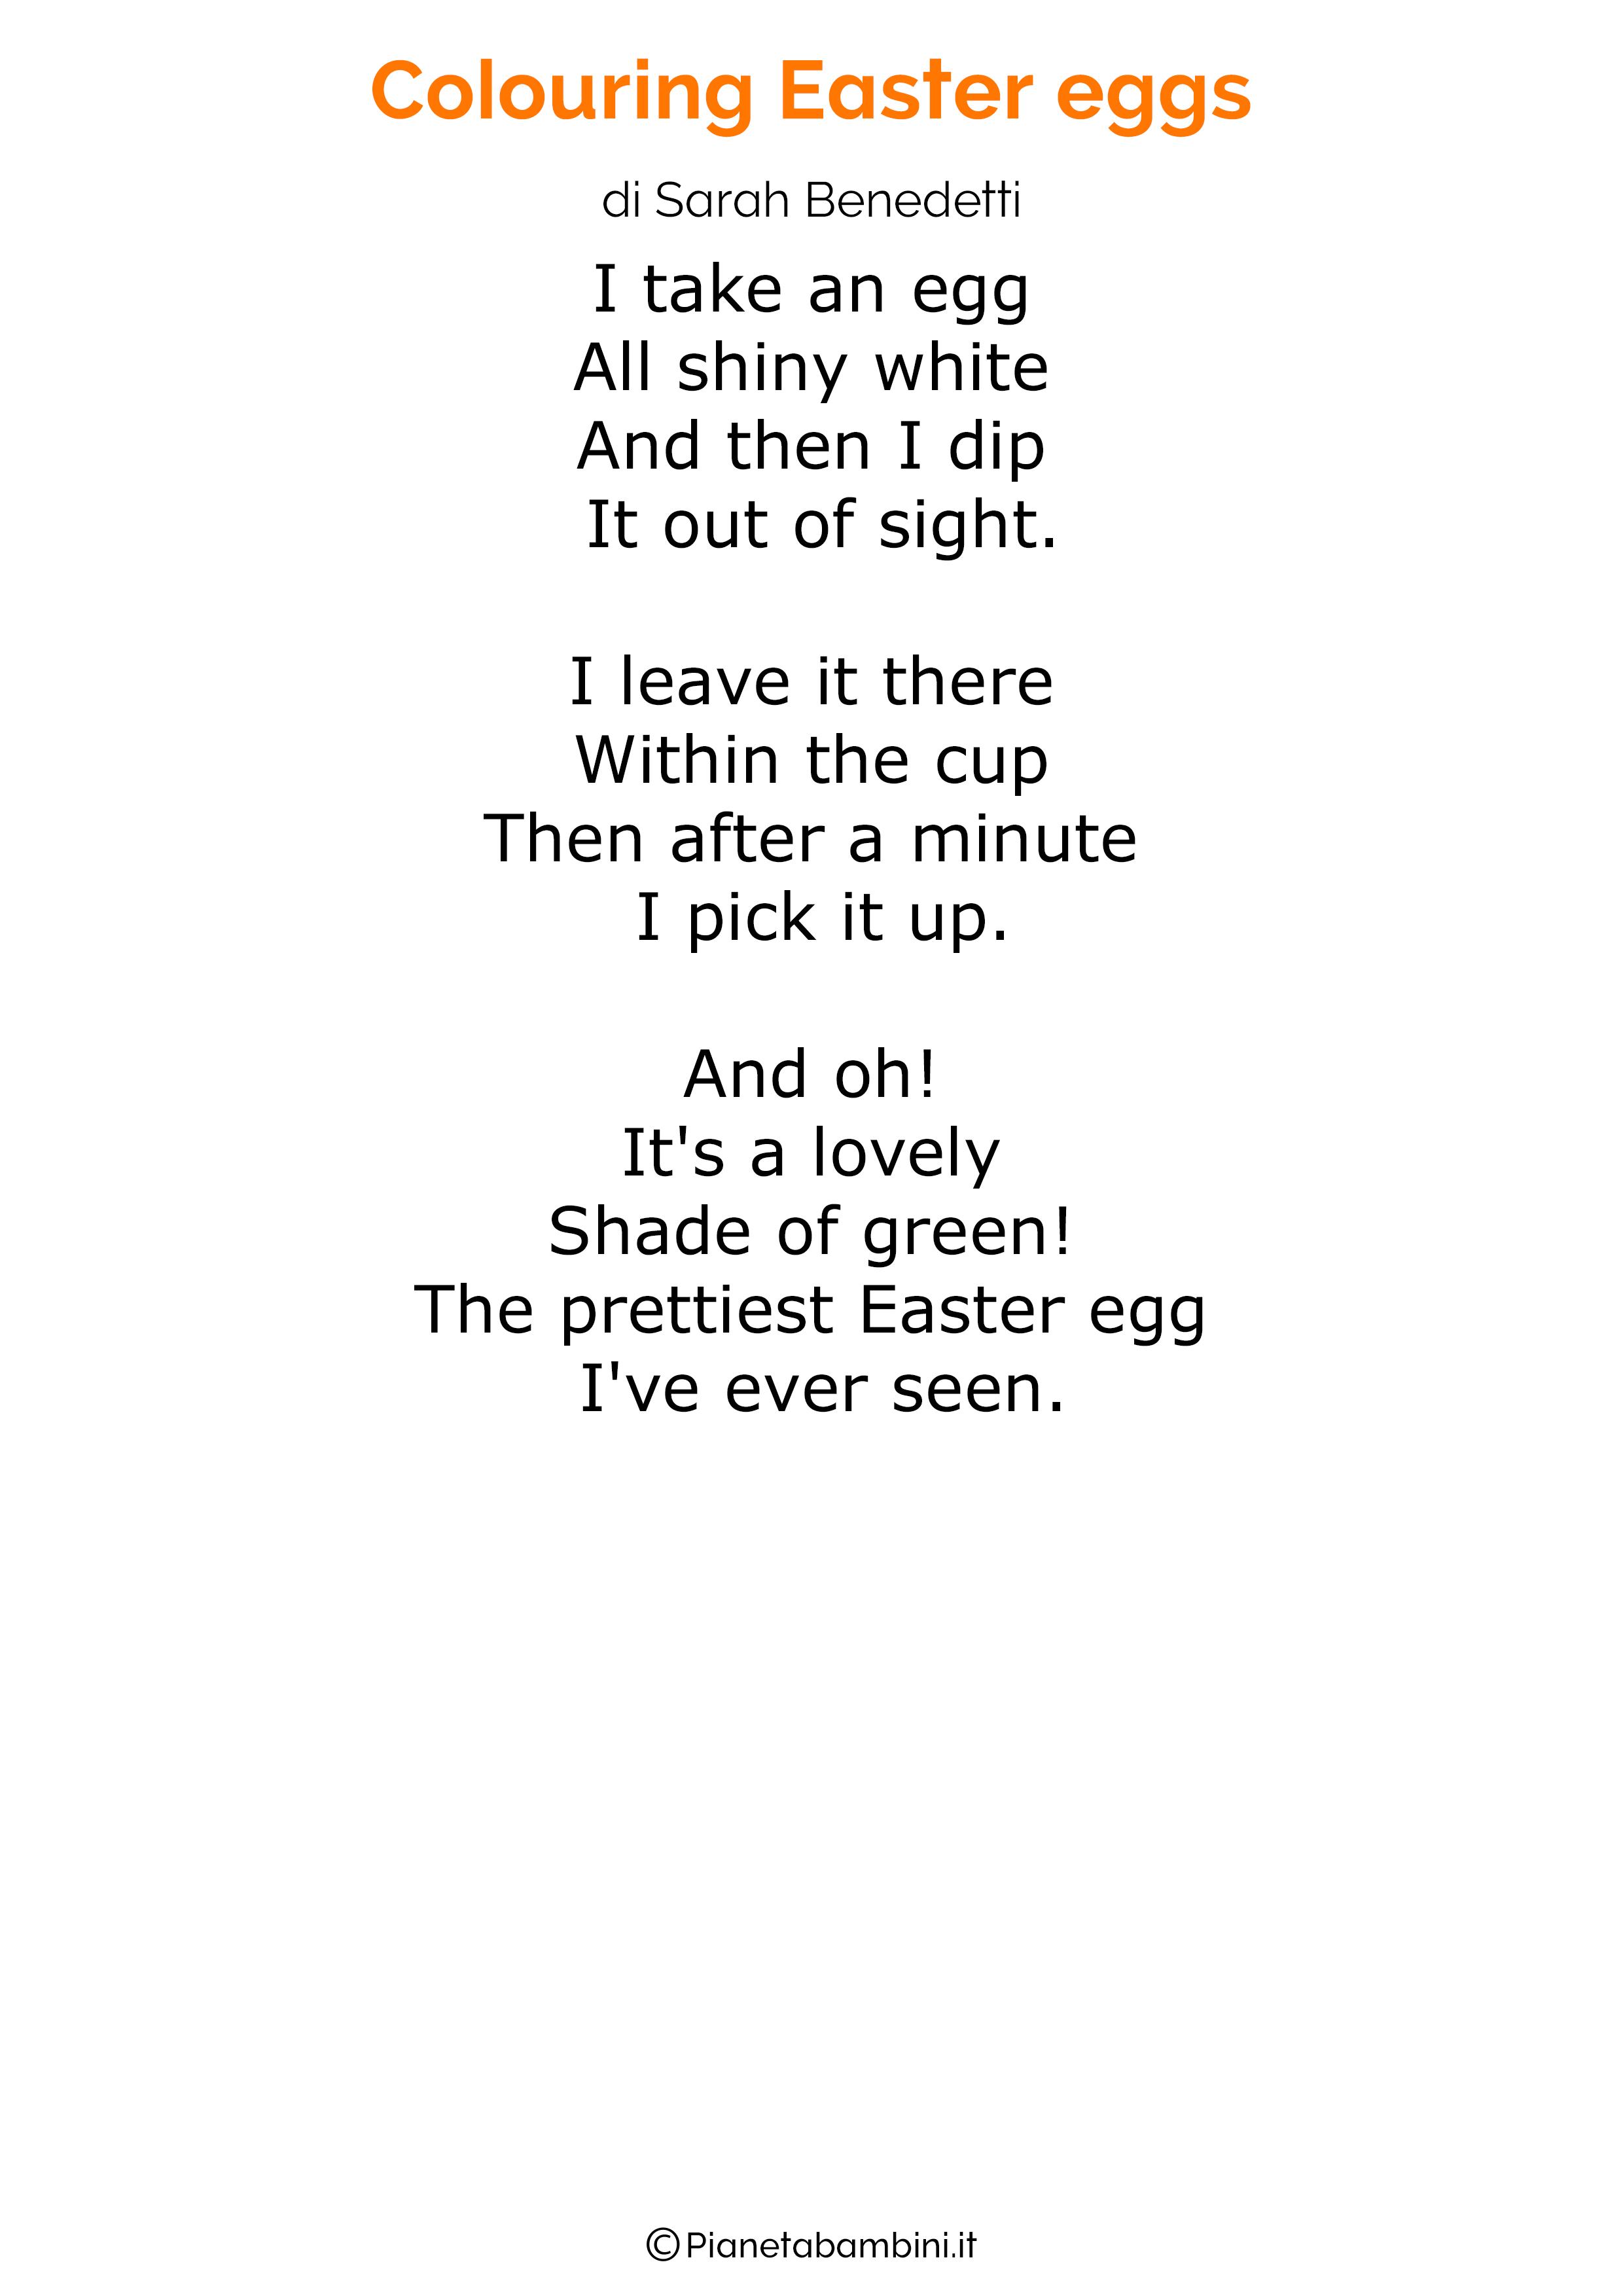 Poesie di Pasqua in inglese per bambini 26